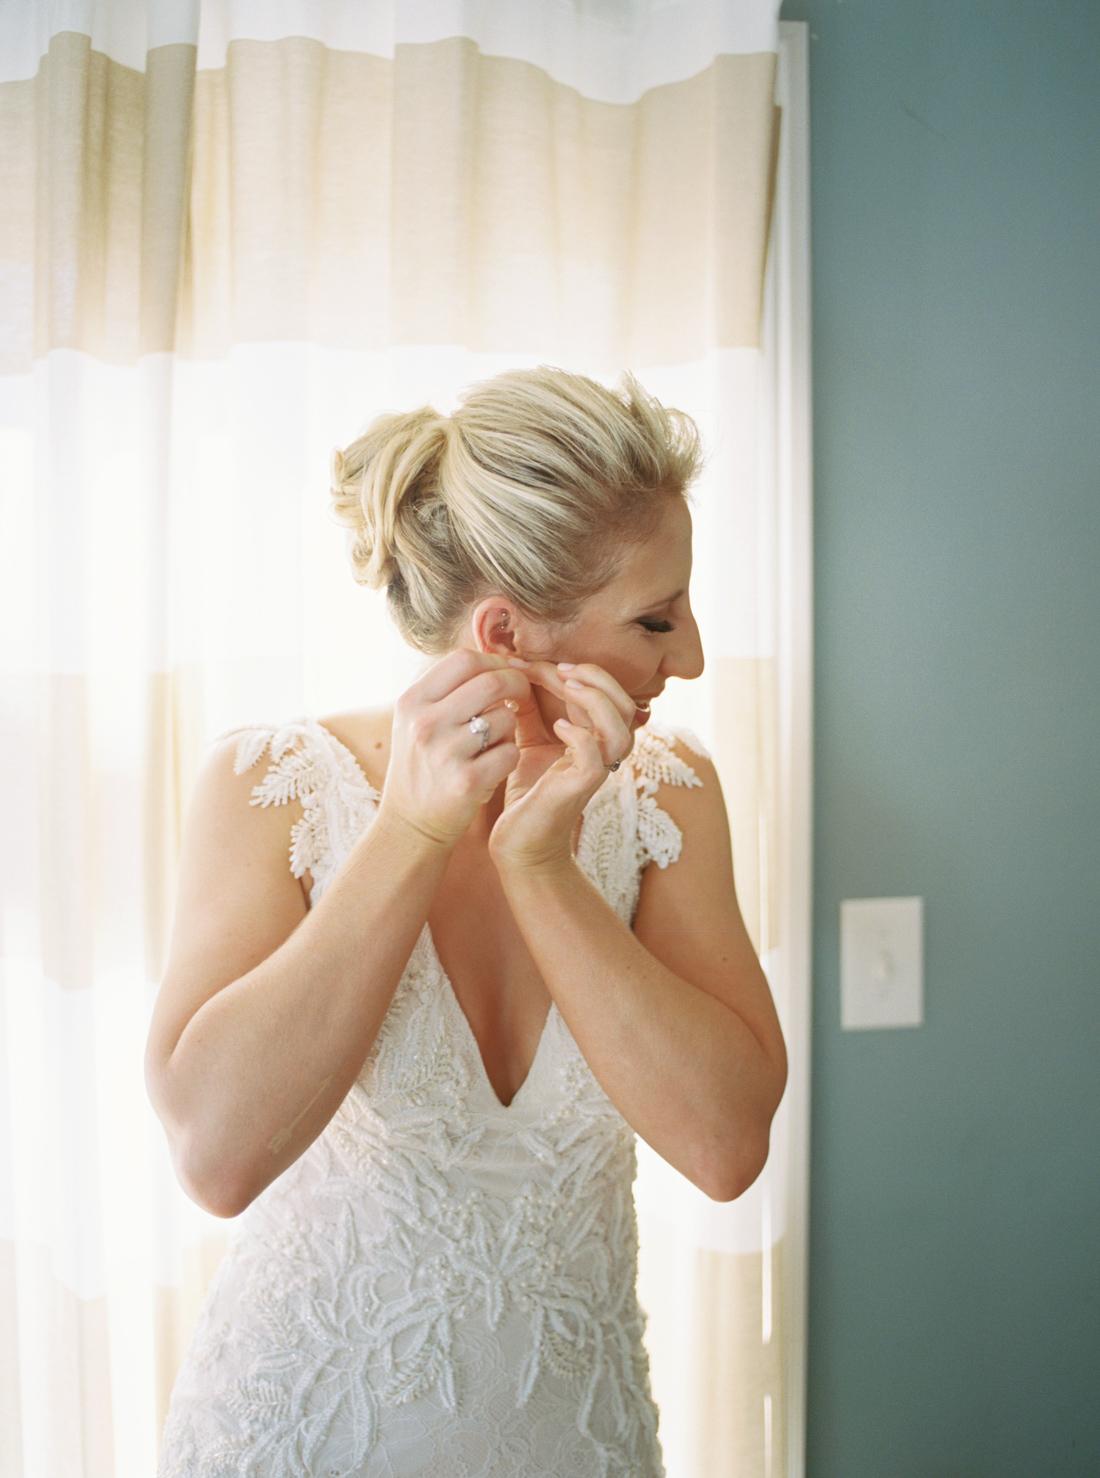 Michelle-whitley-maryland-wedding-photographer